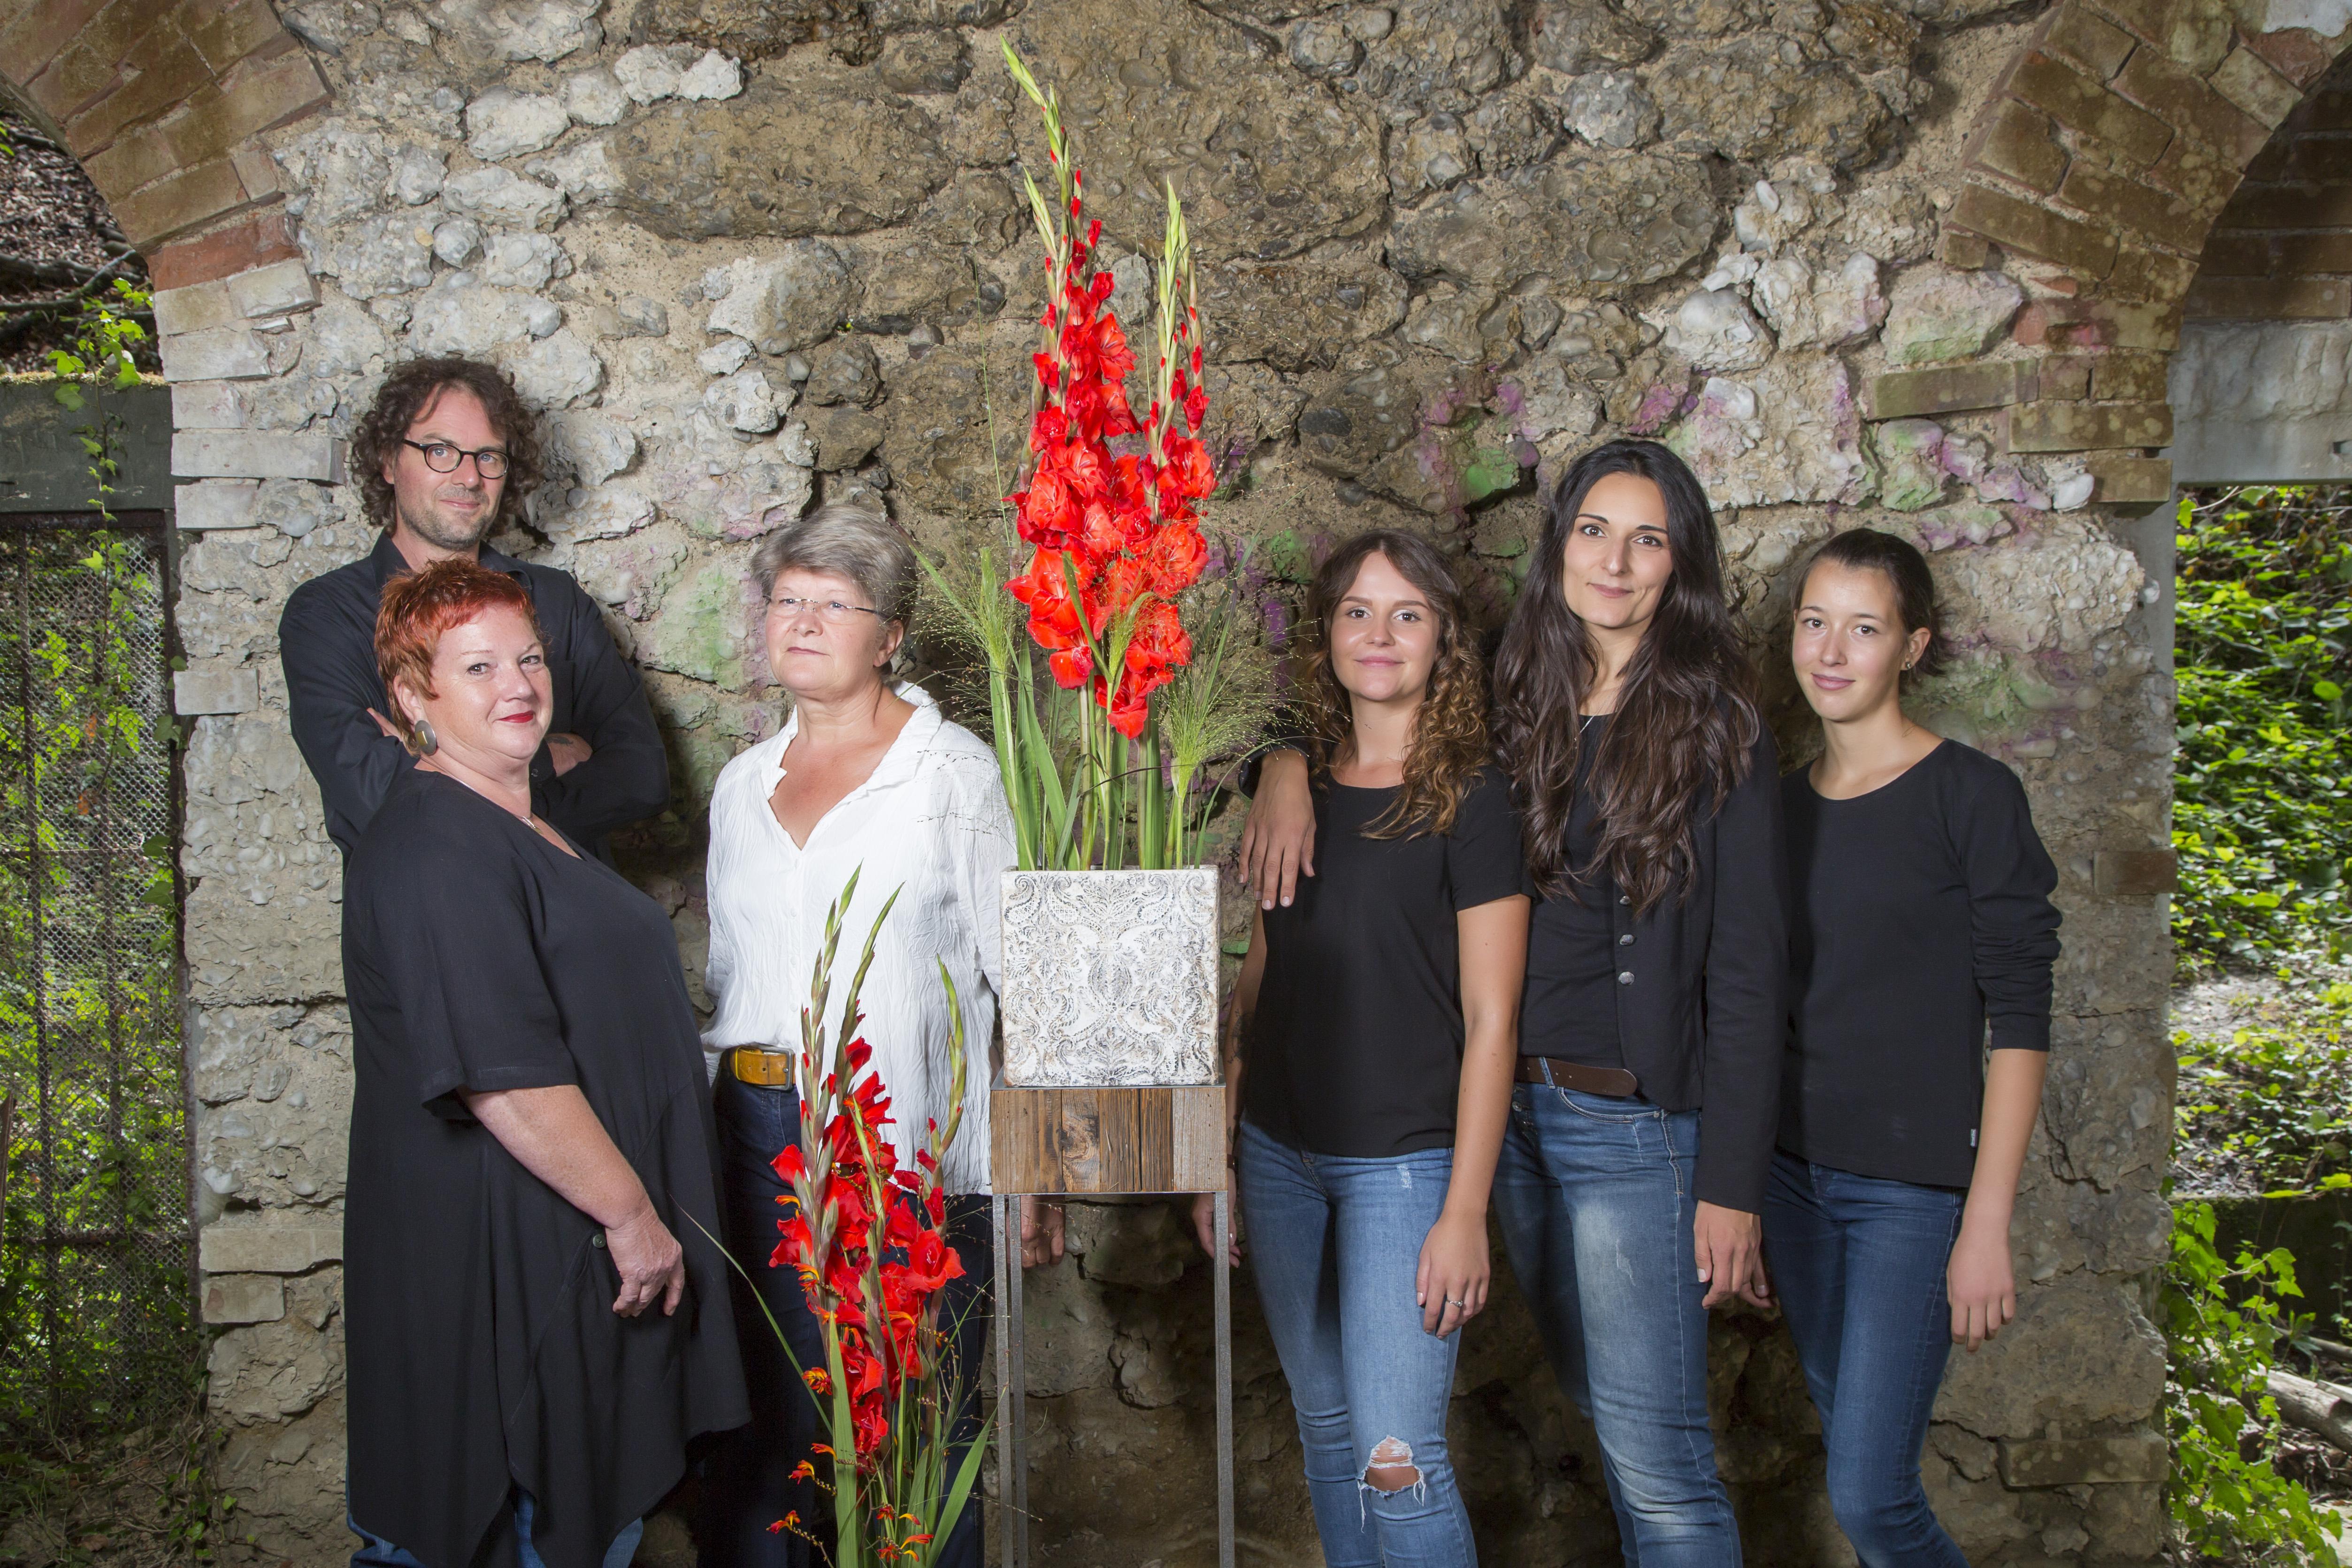 Herfurth Blumenhaus Team